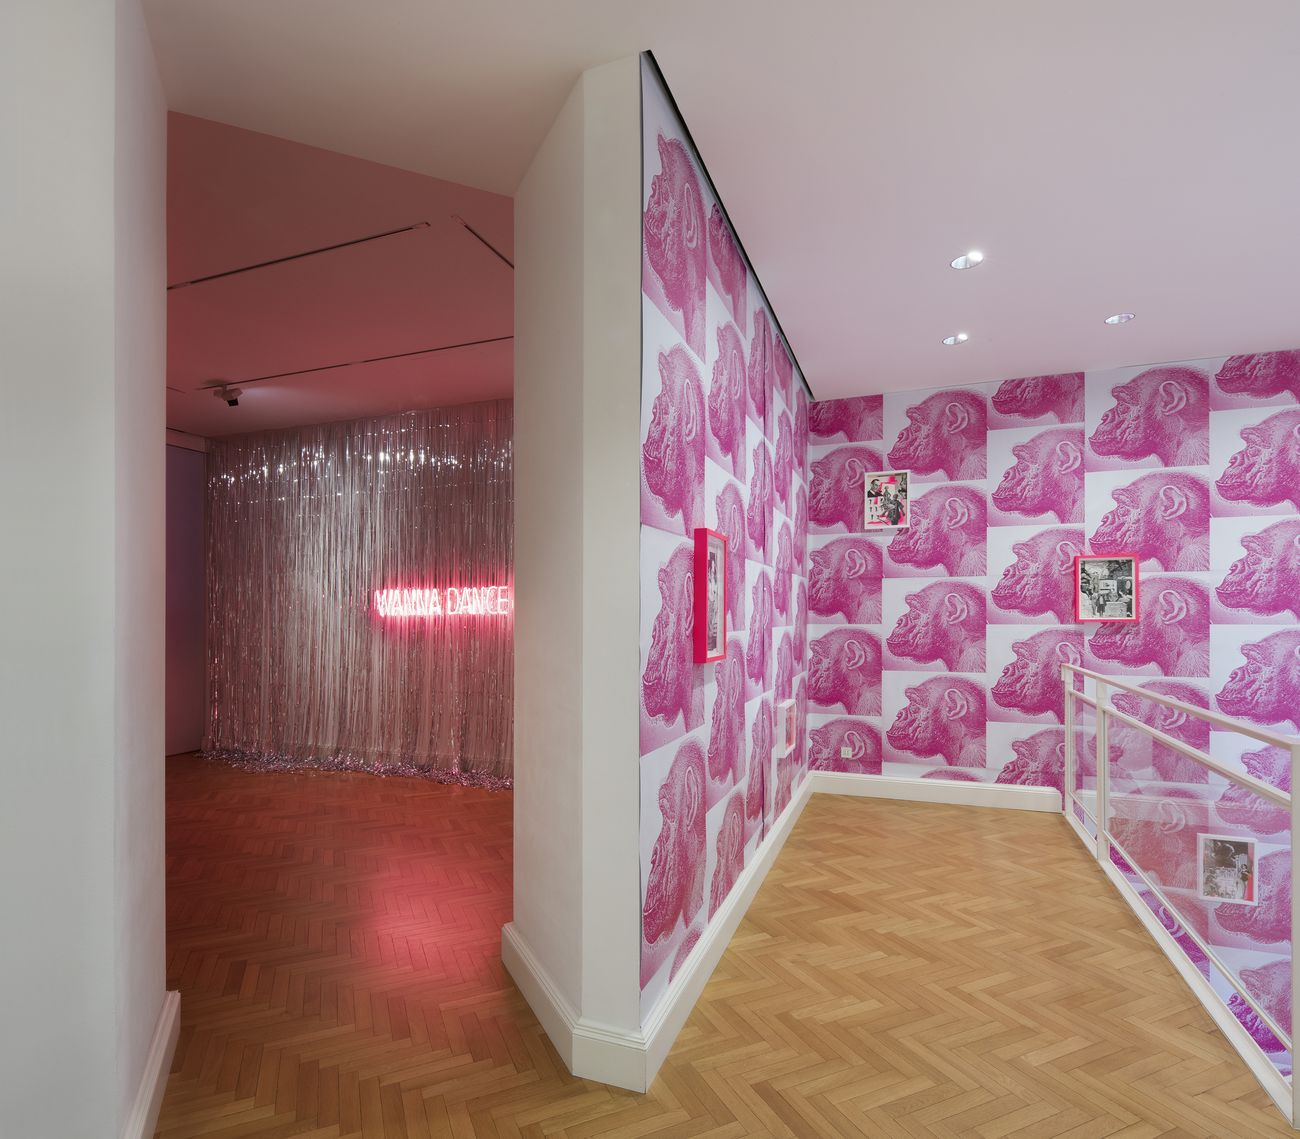 KINGS. Dancing30. Exhibition view at Viasaterna Gallery, Milano 2021